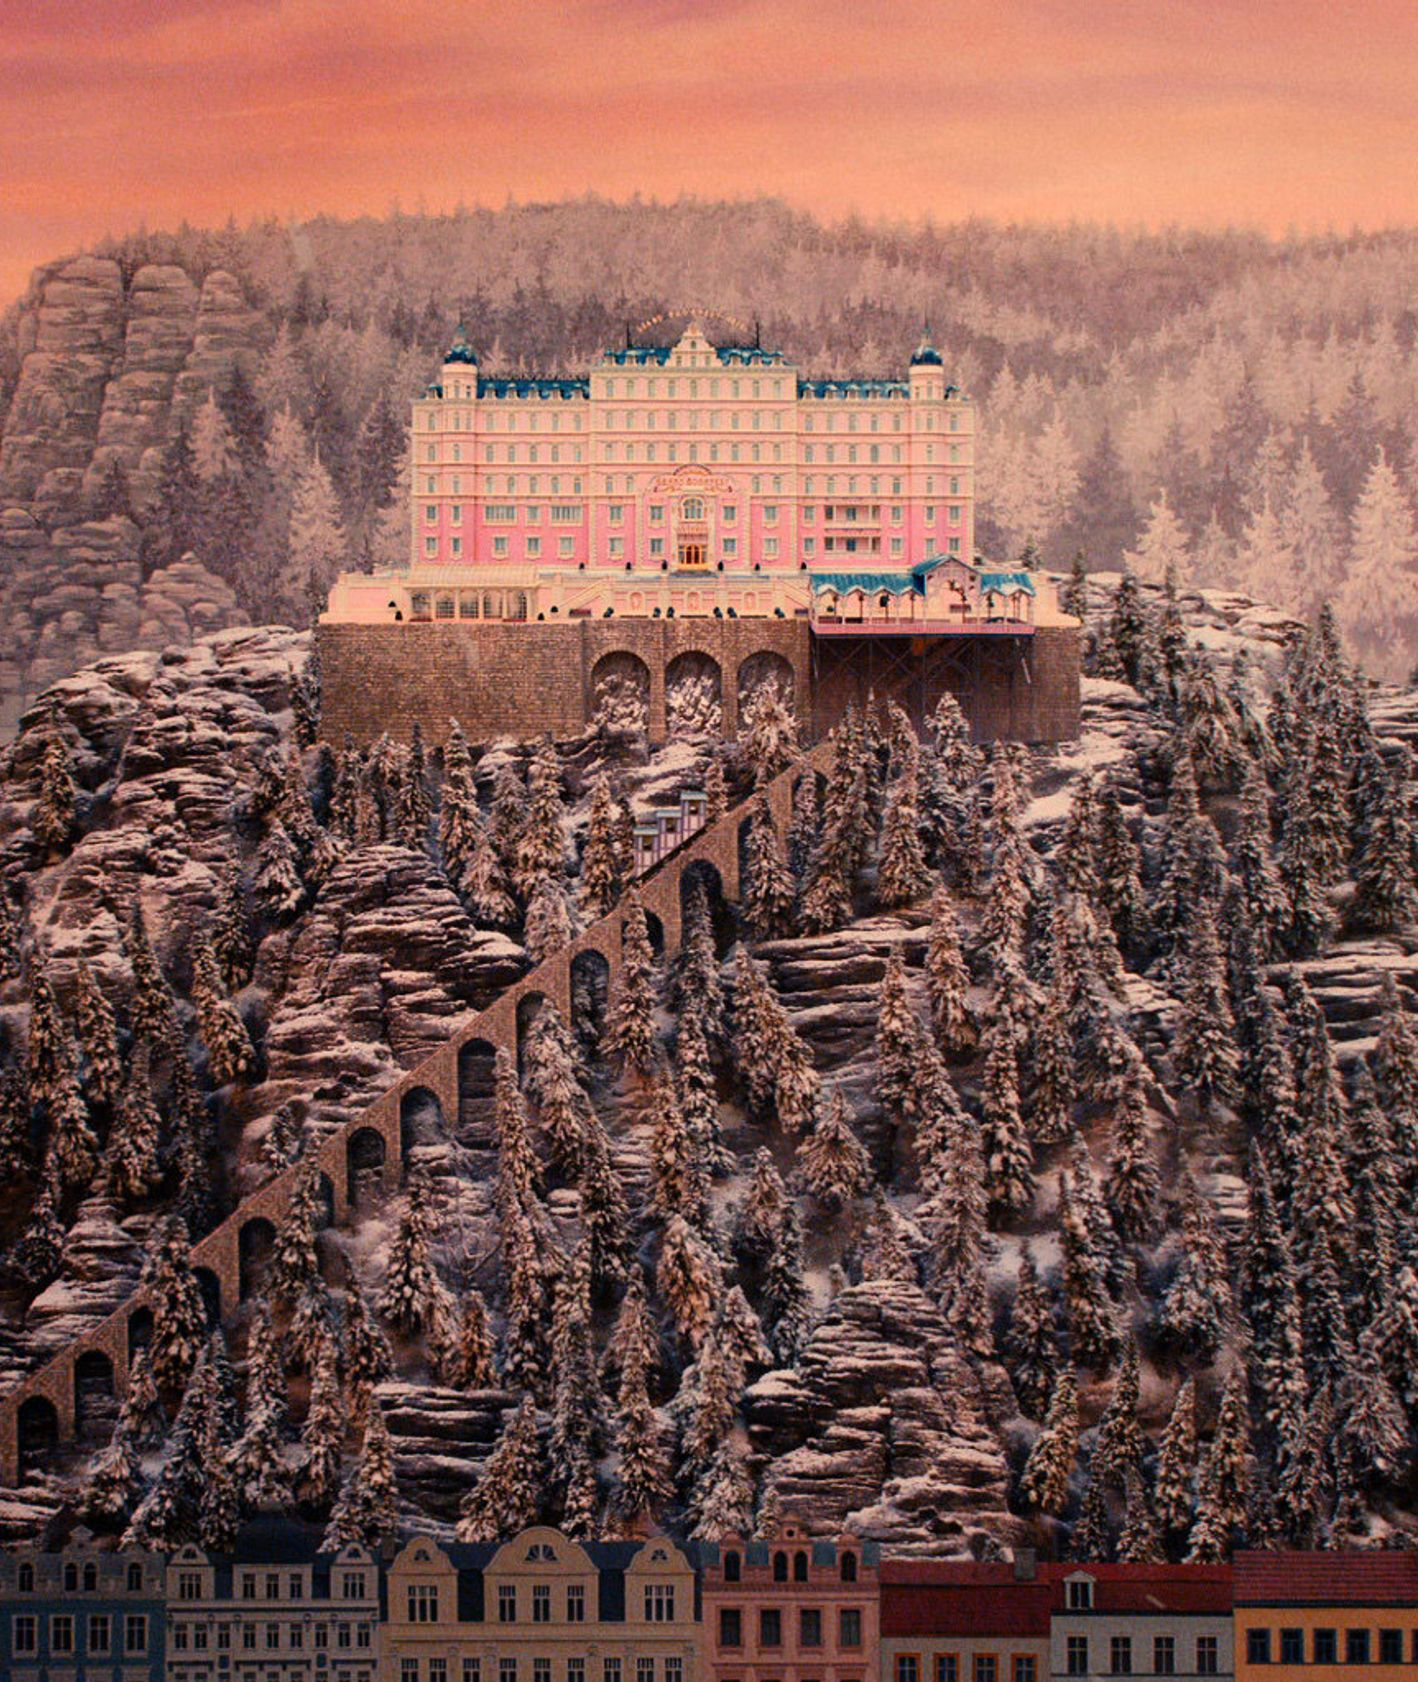 Kadr z filmu Wesa Andersona – widok na Grand Budapest Hotel (fot. kadr z filmu)